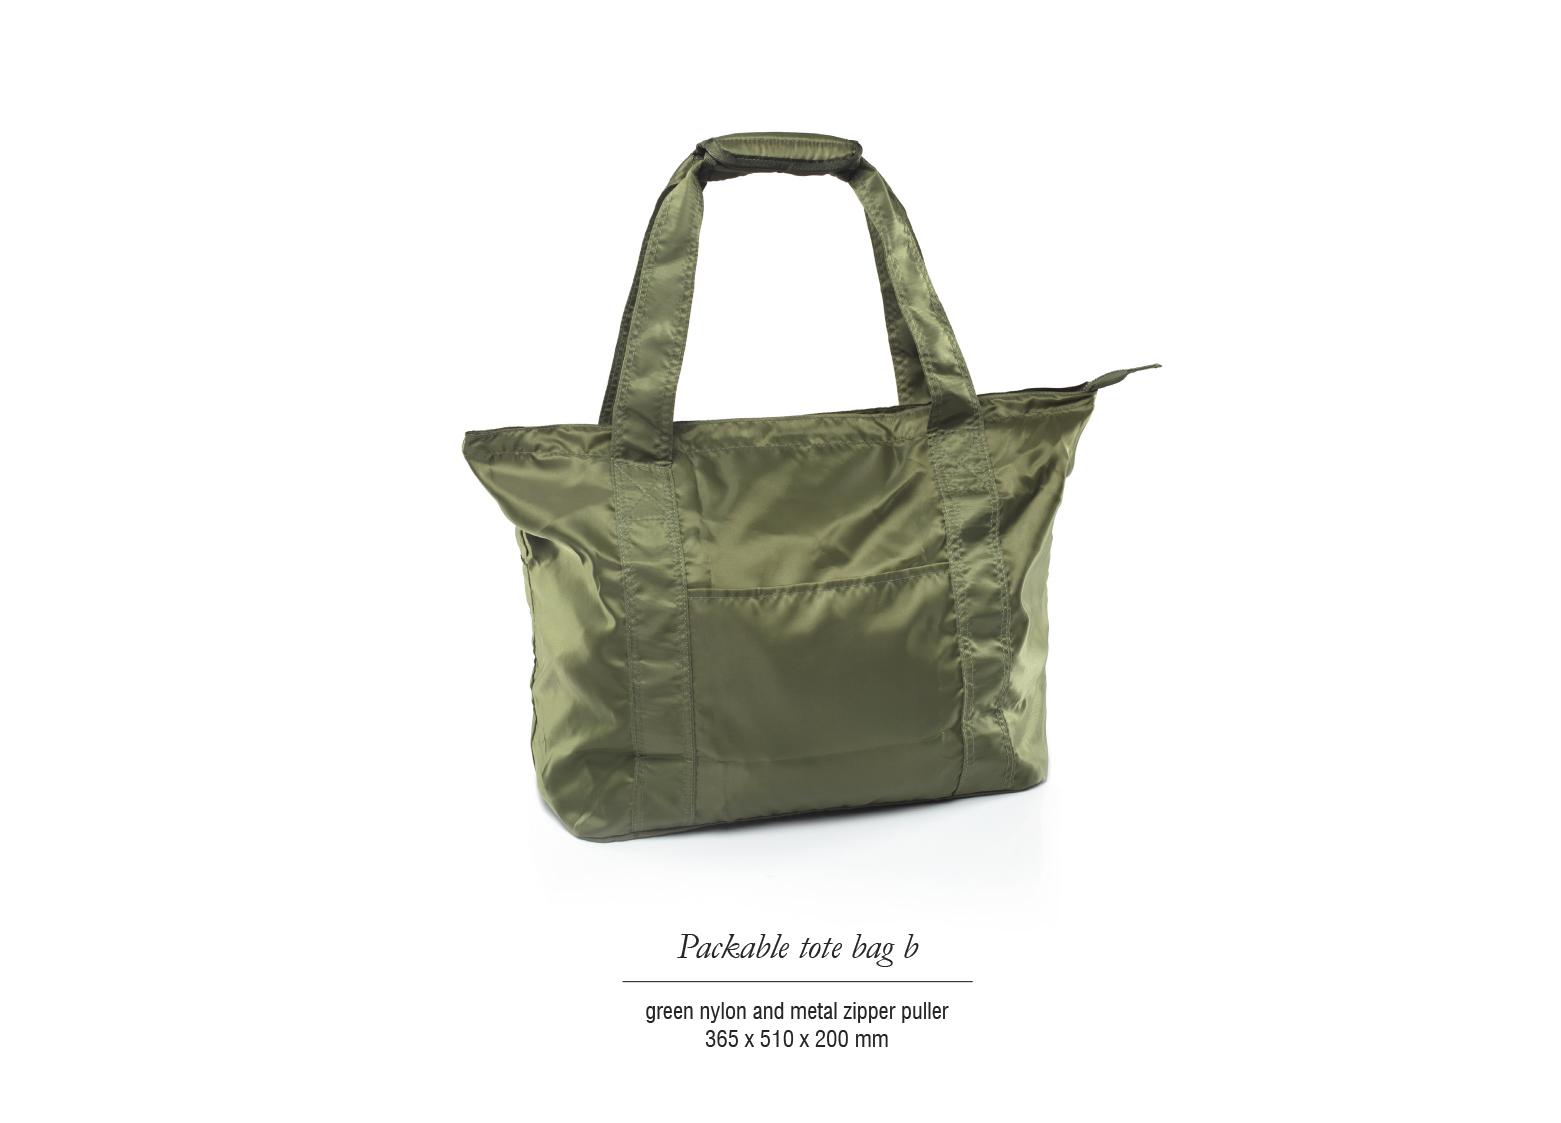 Amenity bags catalogue 2016_SHcollection_V6 94.jpg